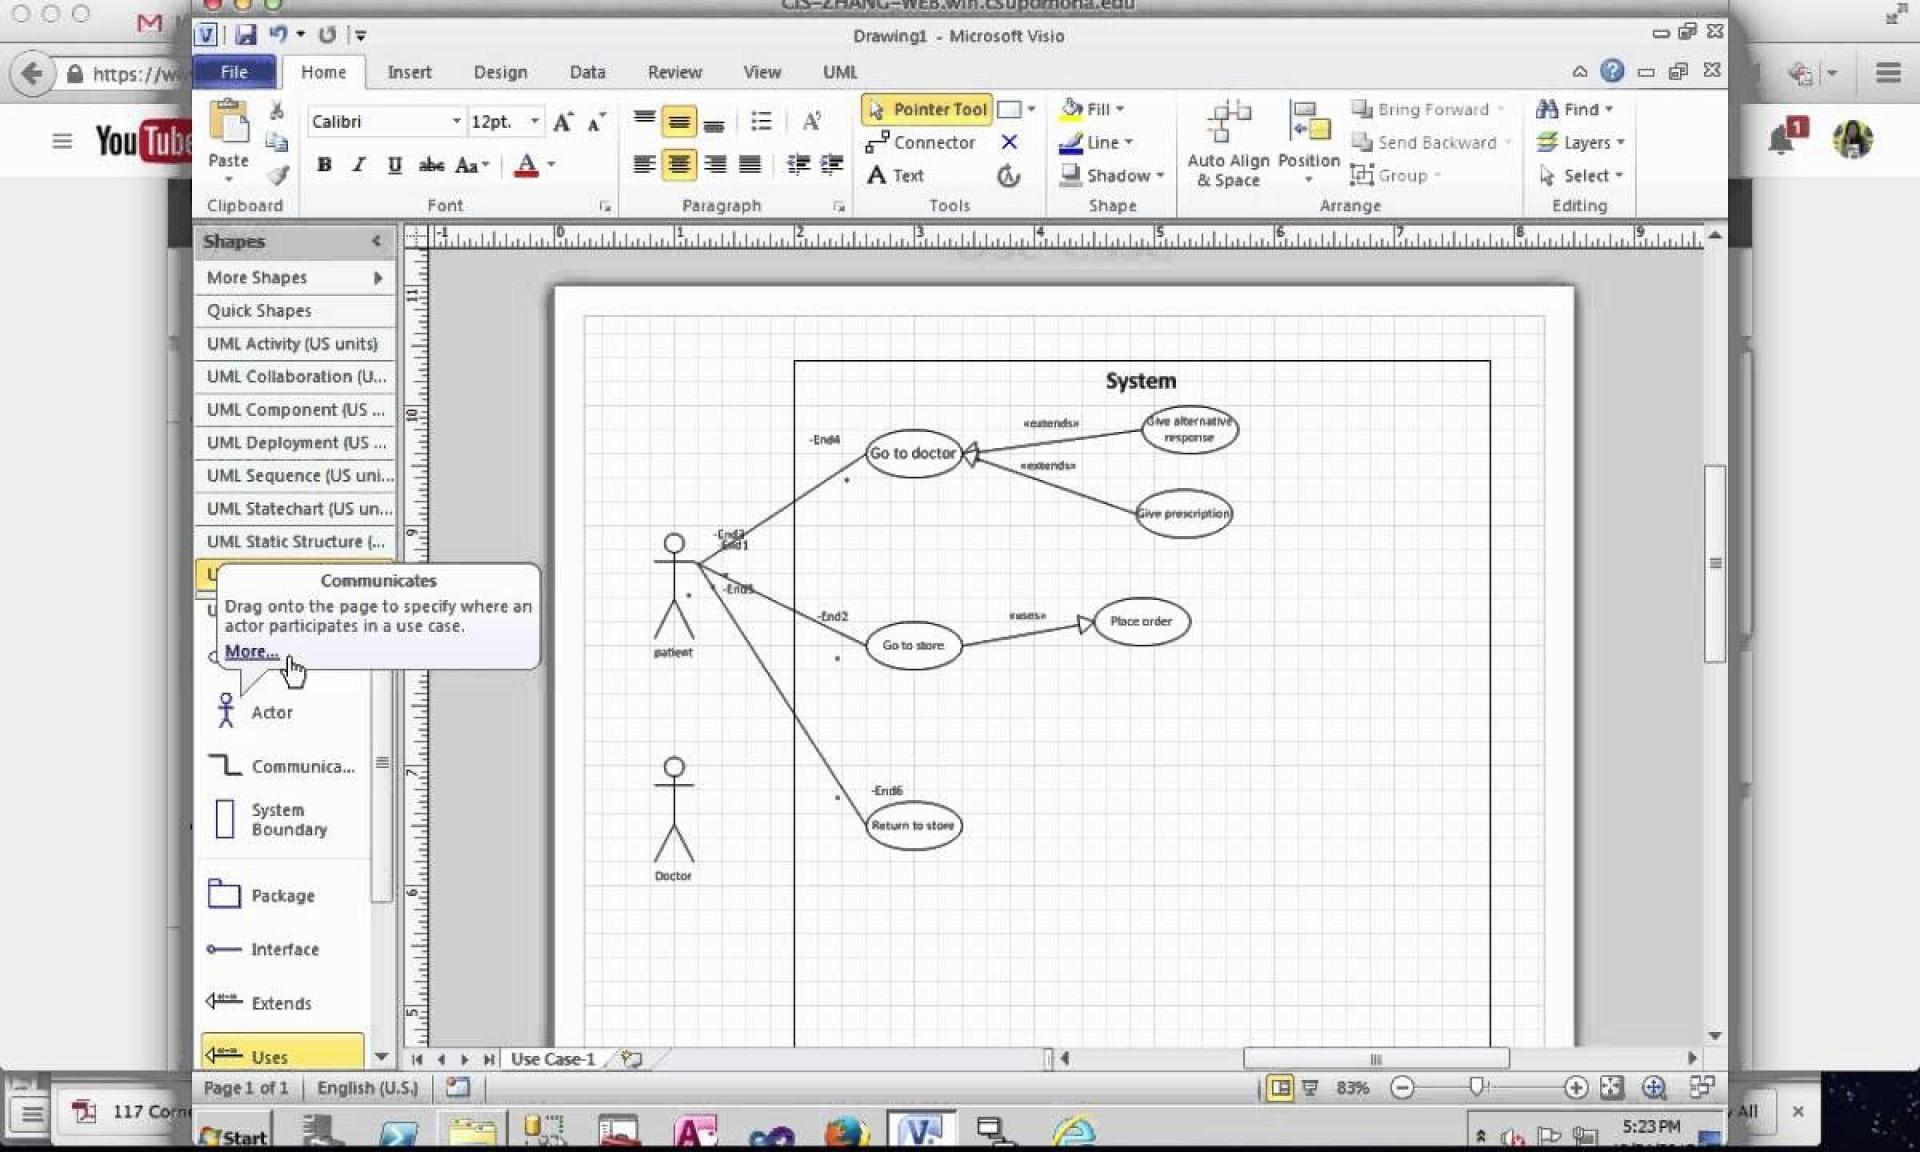 004 Stirring Use Case Diagram Microsoft Visio 2010 High Resolution 1920